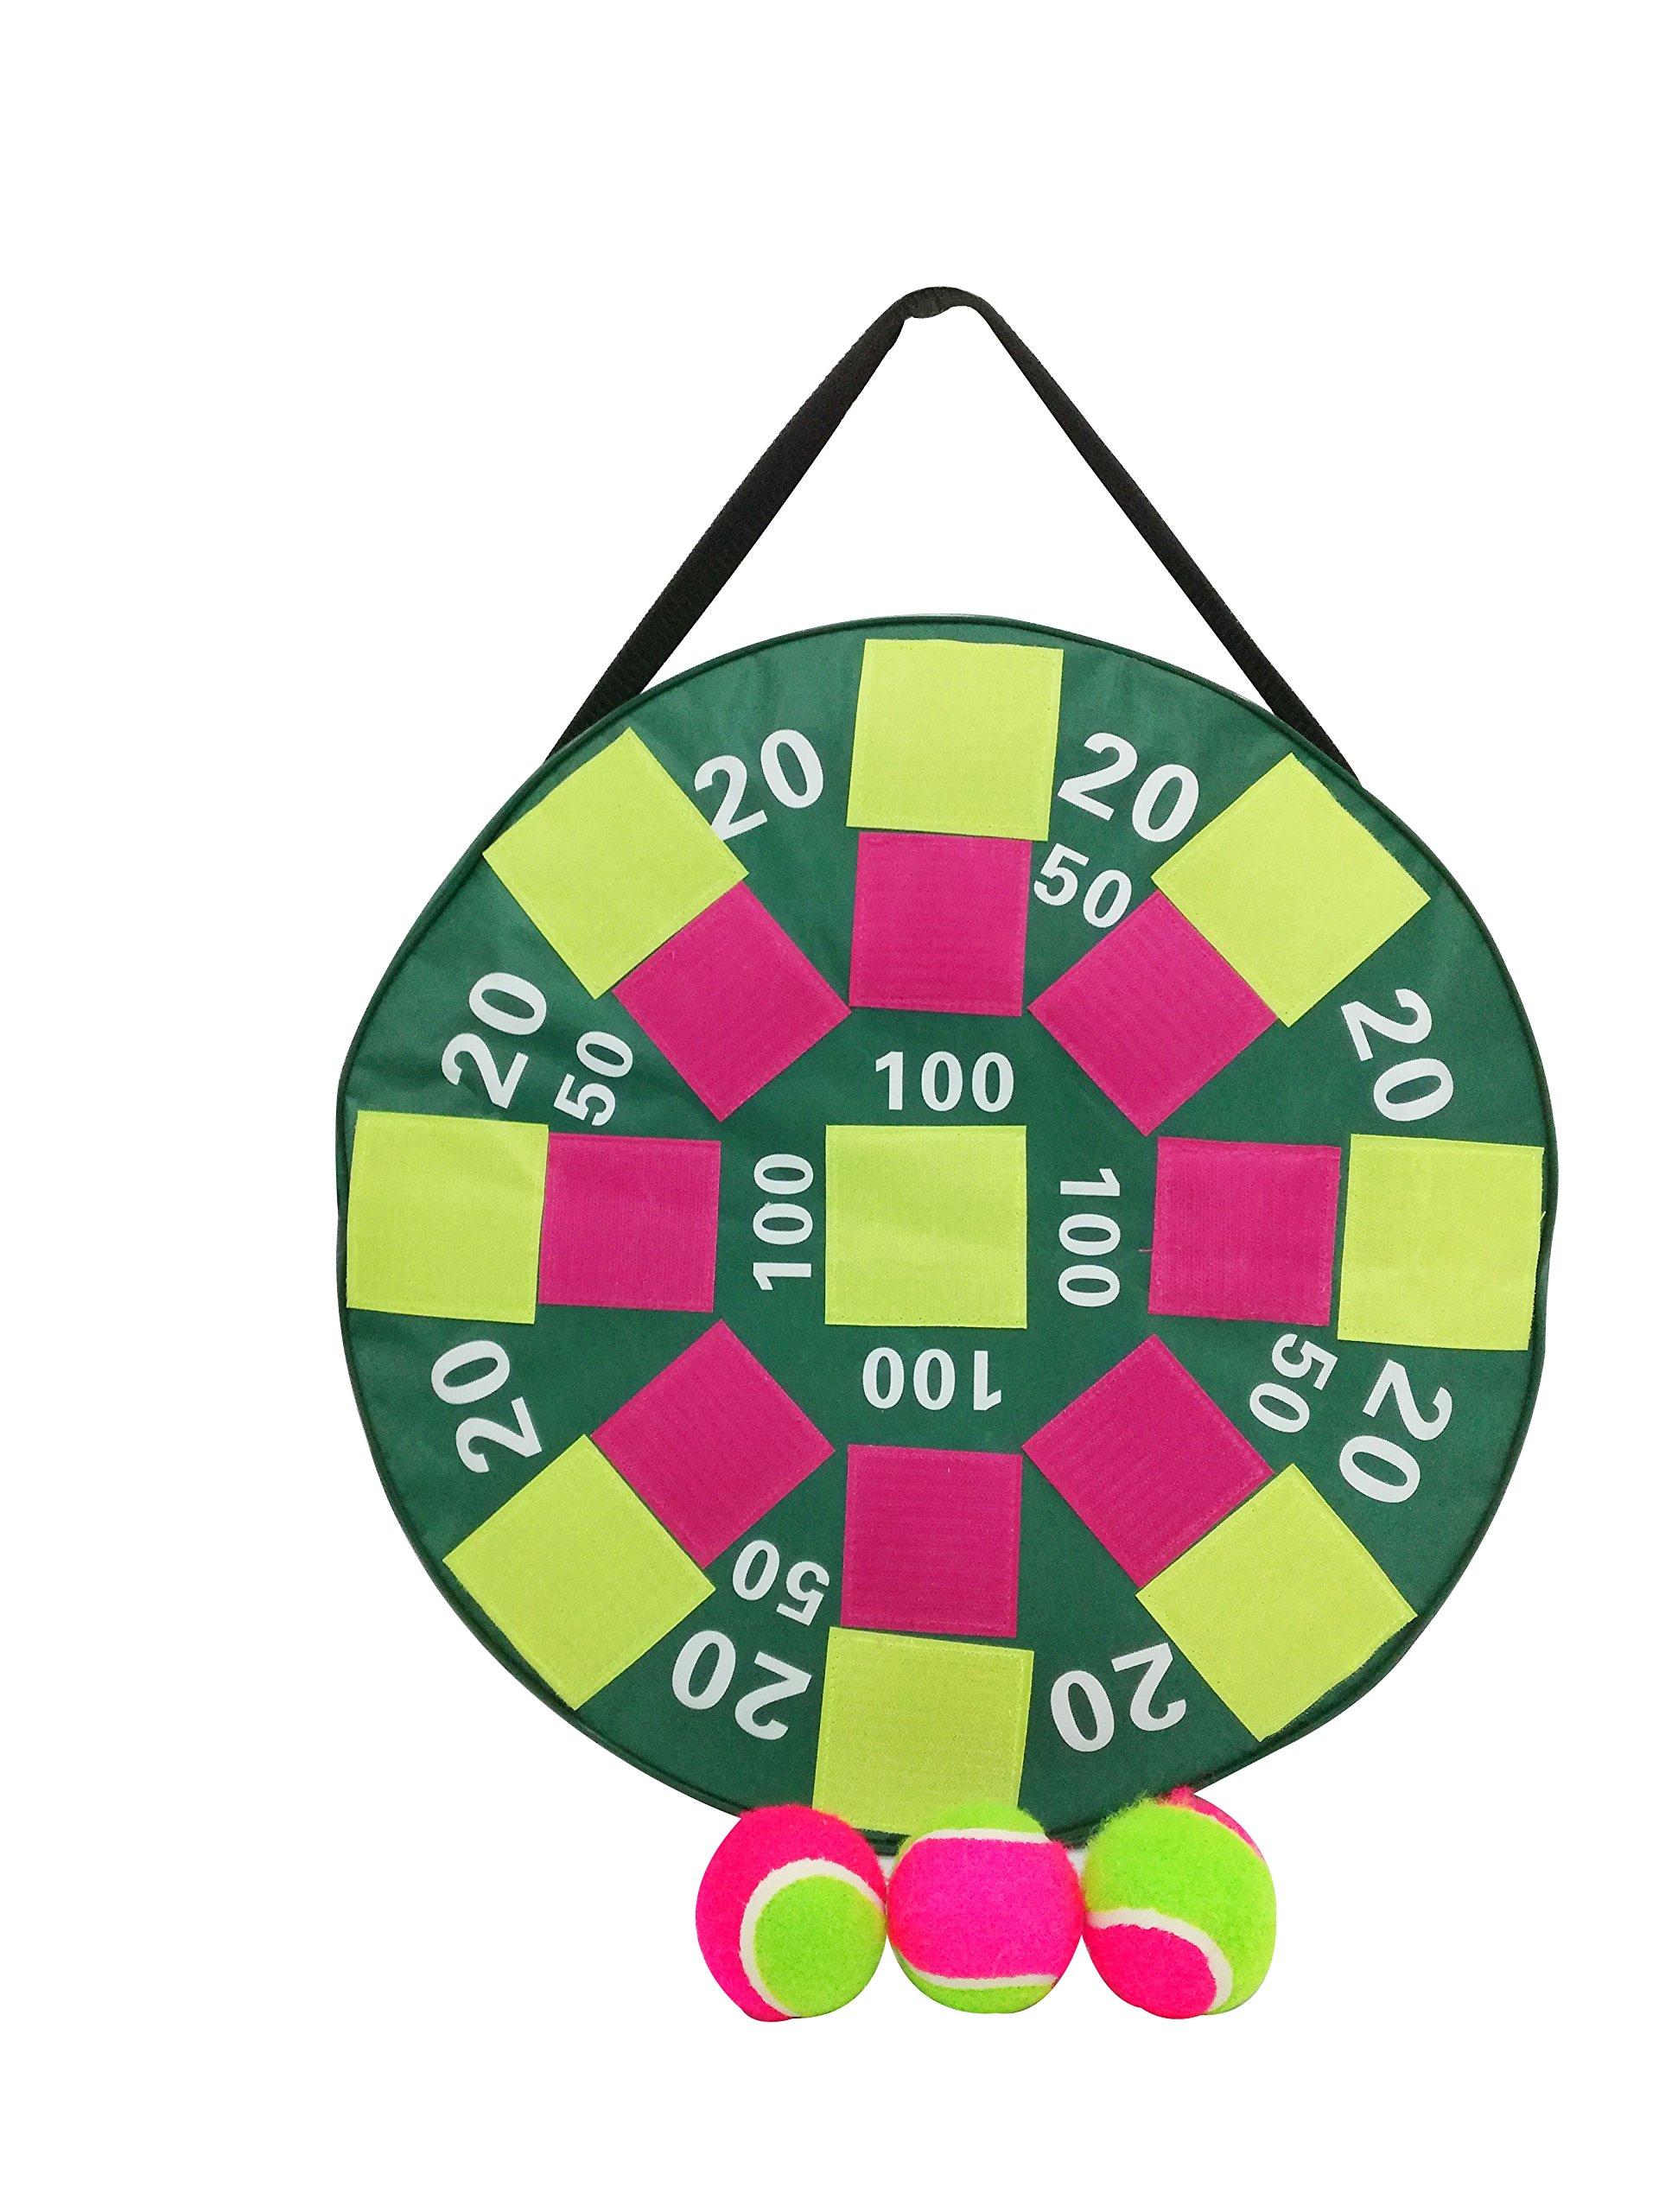 Heemika Inflatable Dart Ball Game, Inflatable Target Game ,Inflatable DartBoard with Velcro Balls